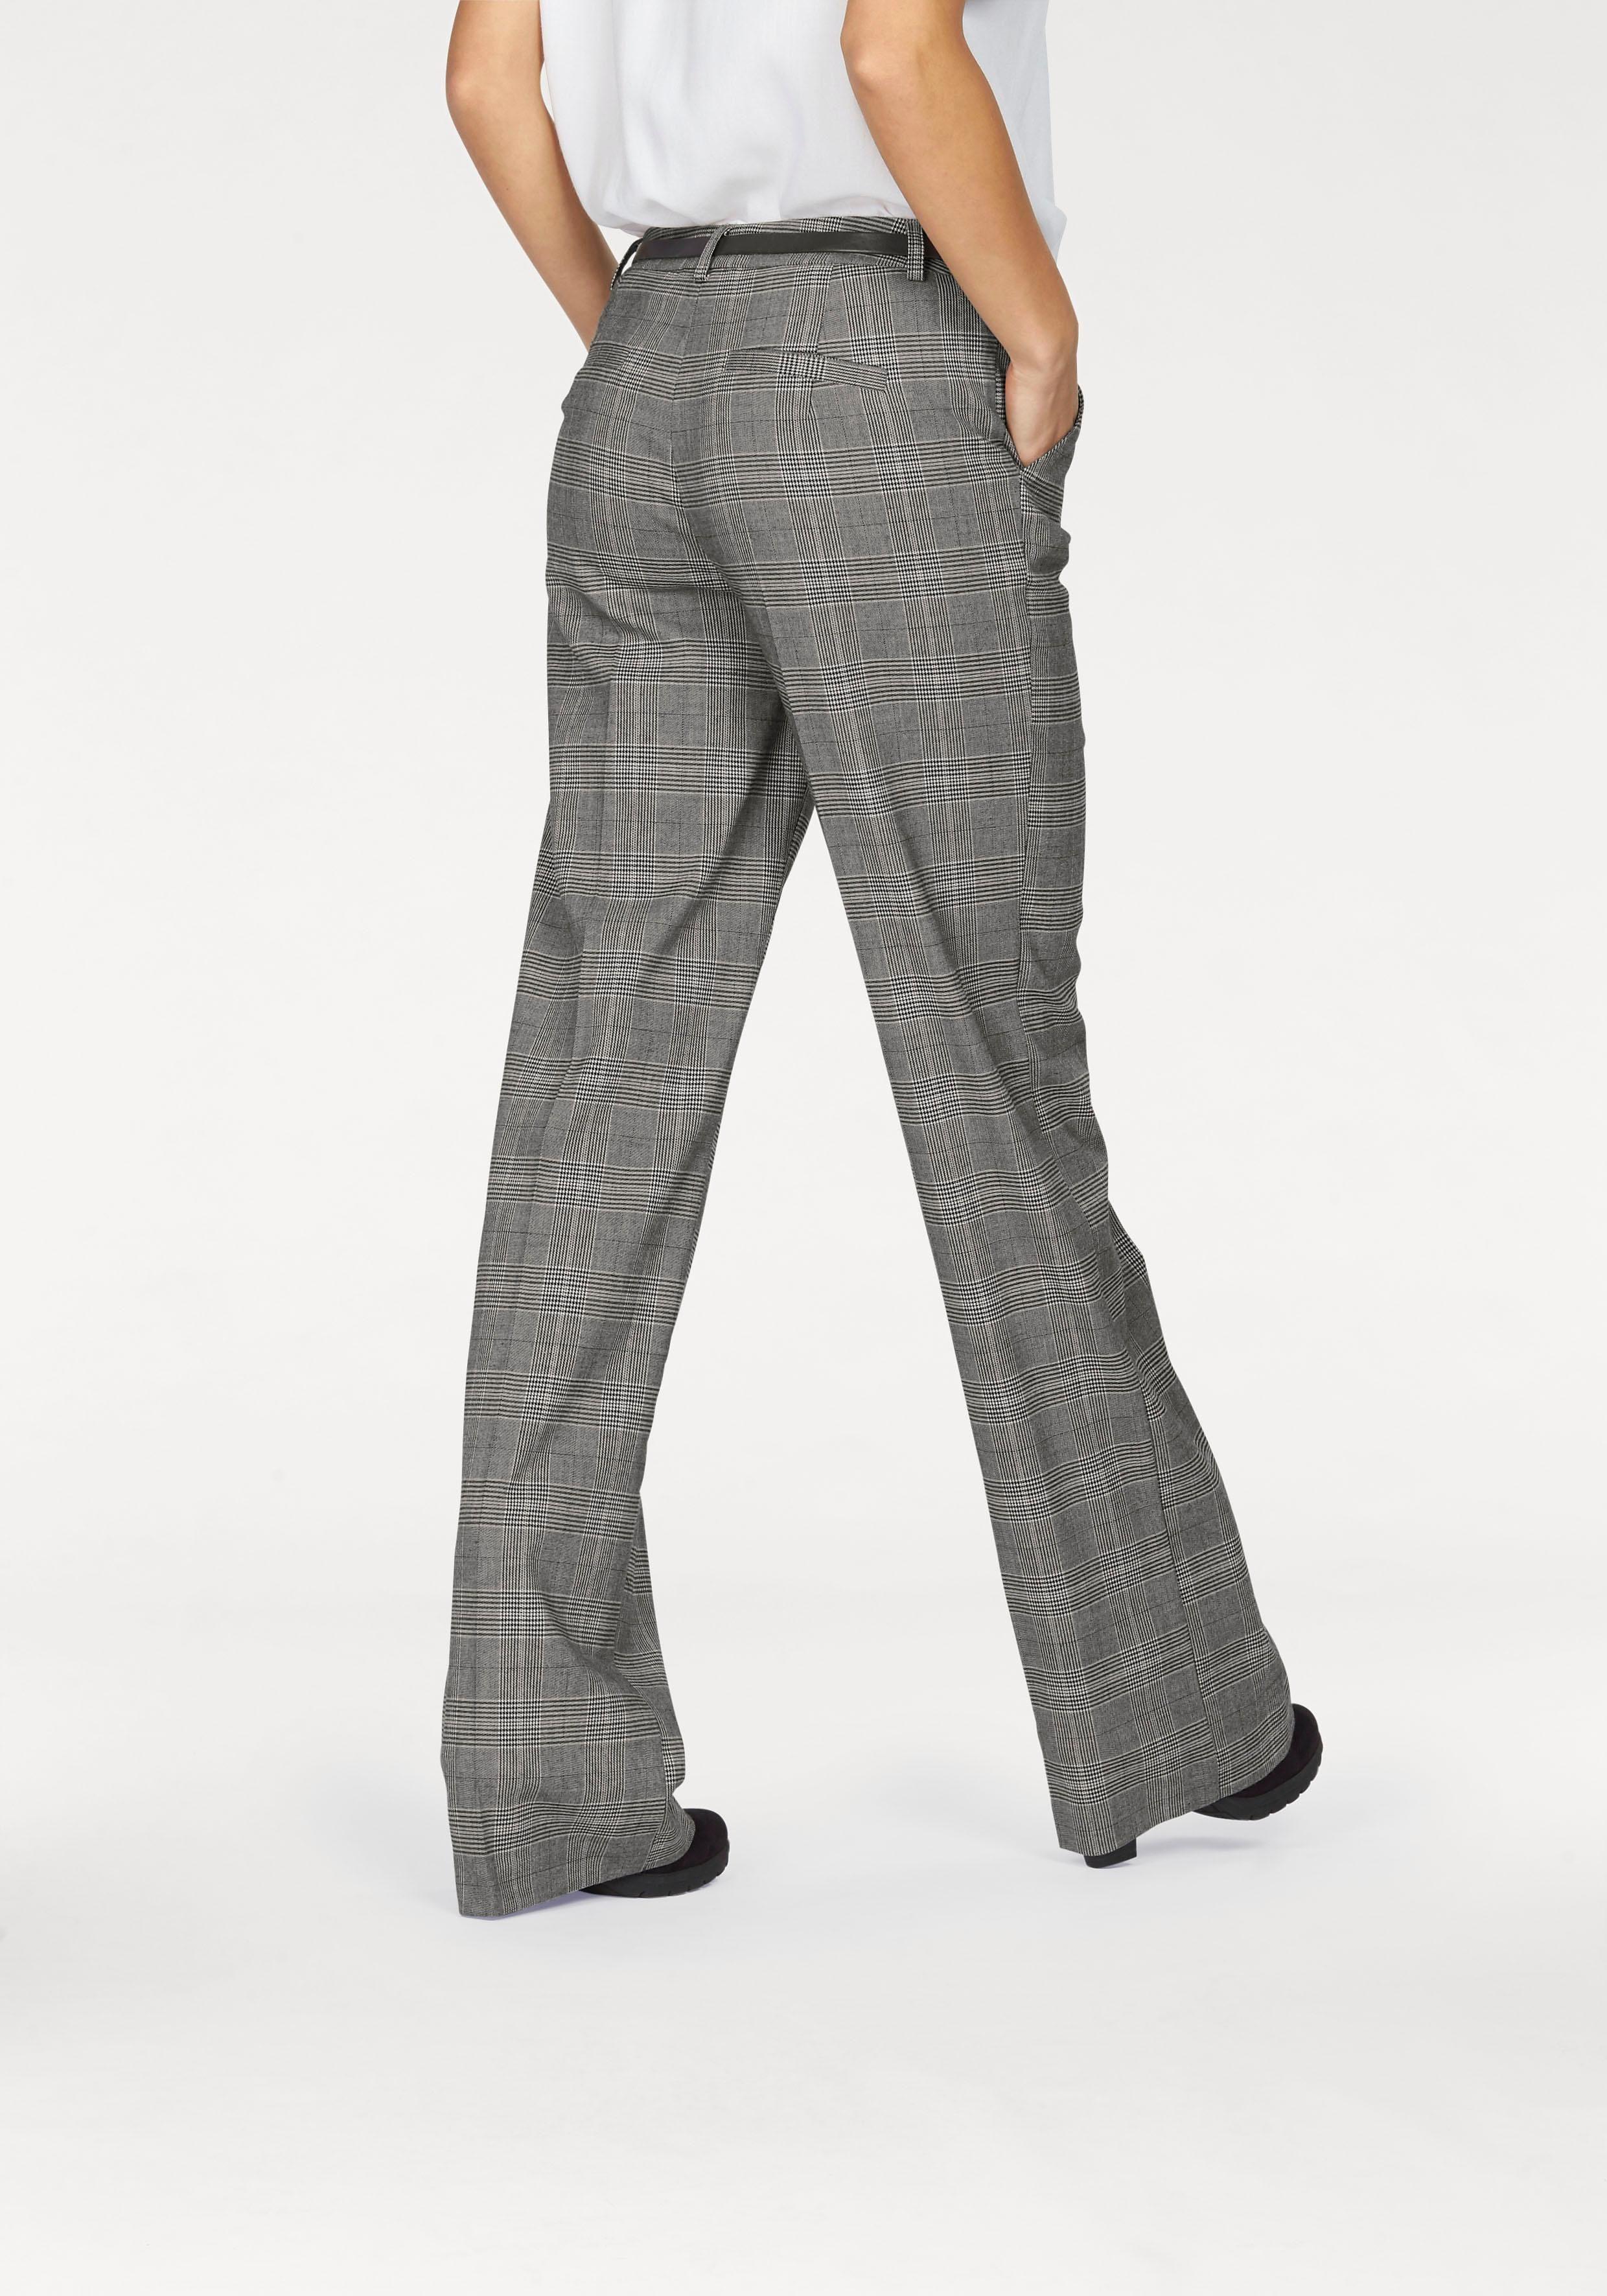 Boysen's Bügelfaltenhose | Bekleidung > Hosen > Bügelfaltenhosen | Boysen's